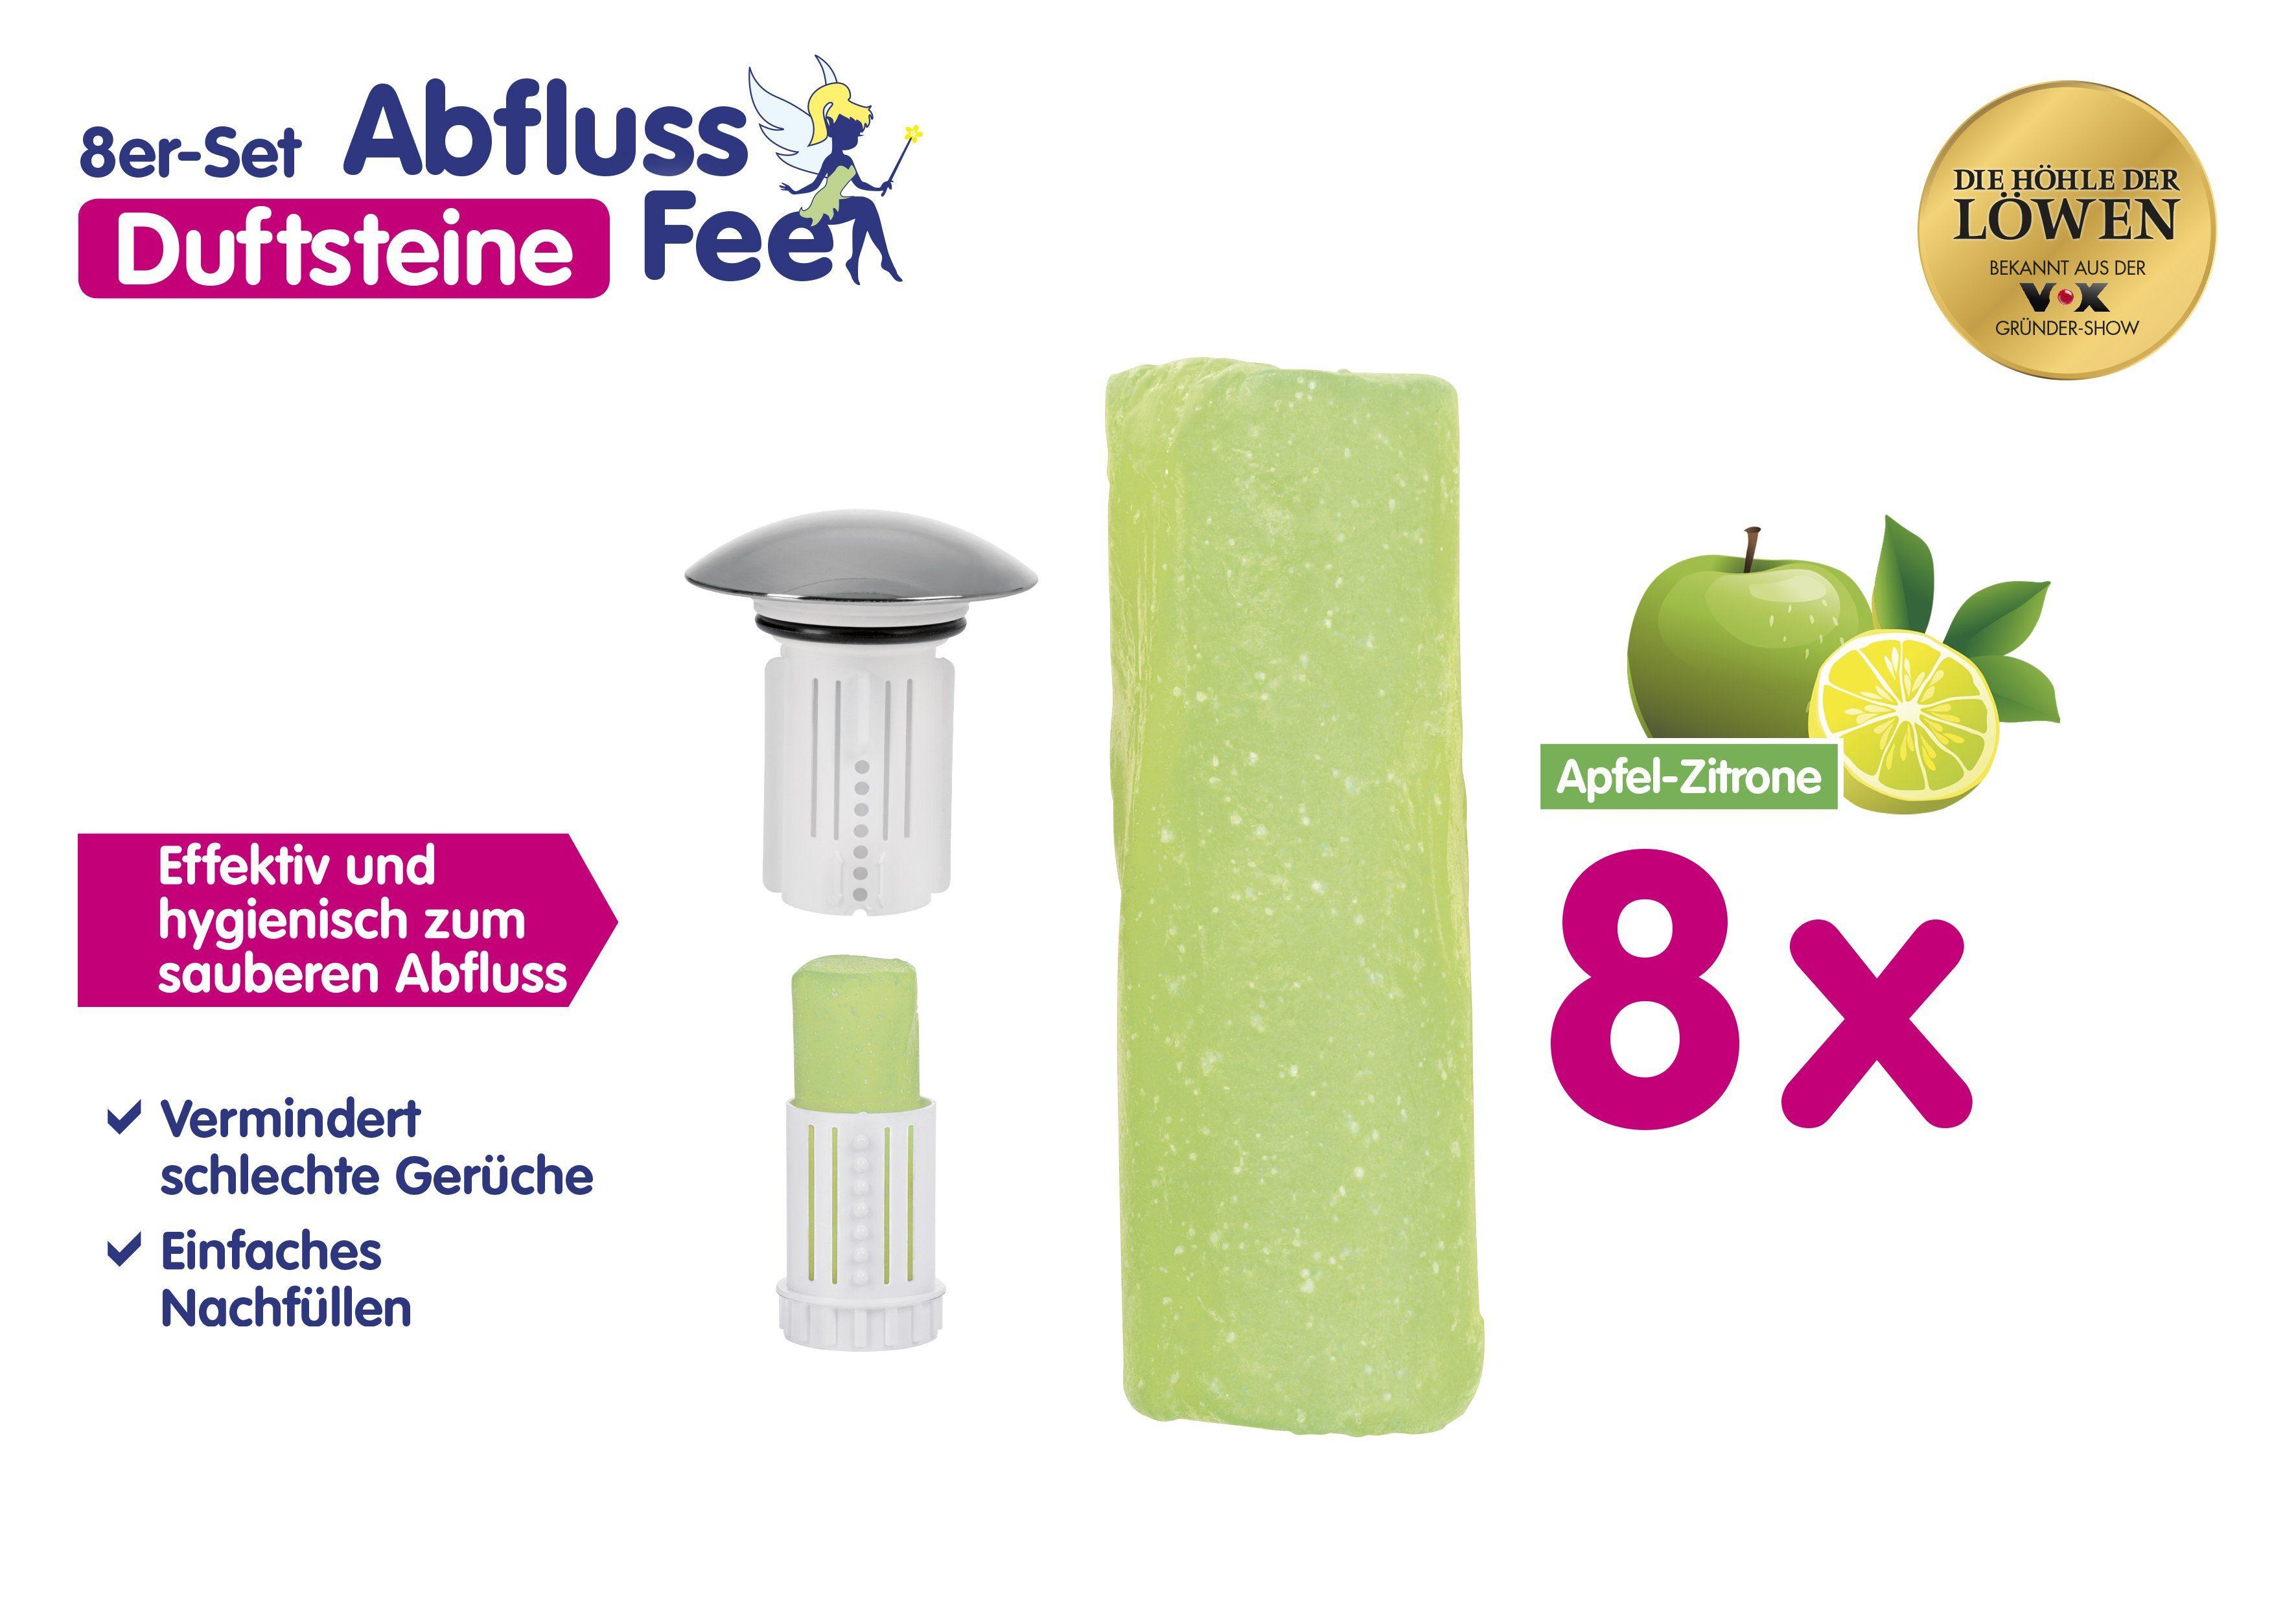 Abfluss Fee Duftstein 8er Set grün Apfel Zitrone